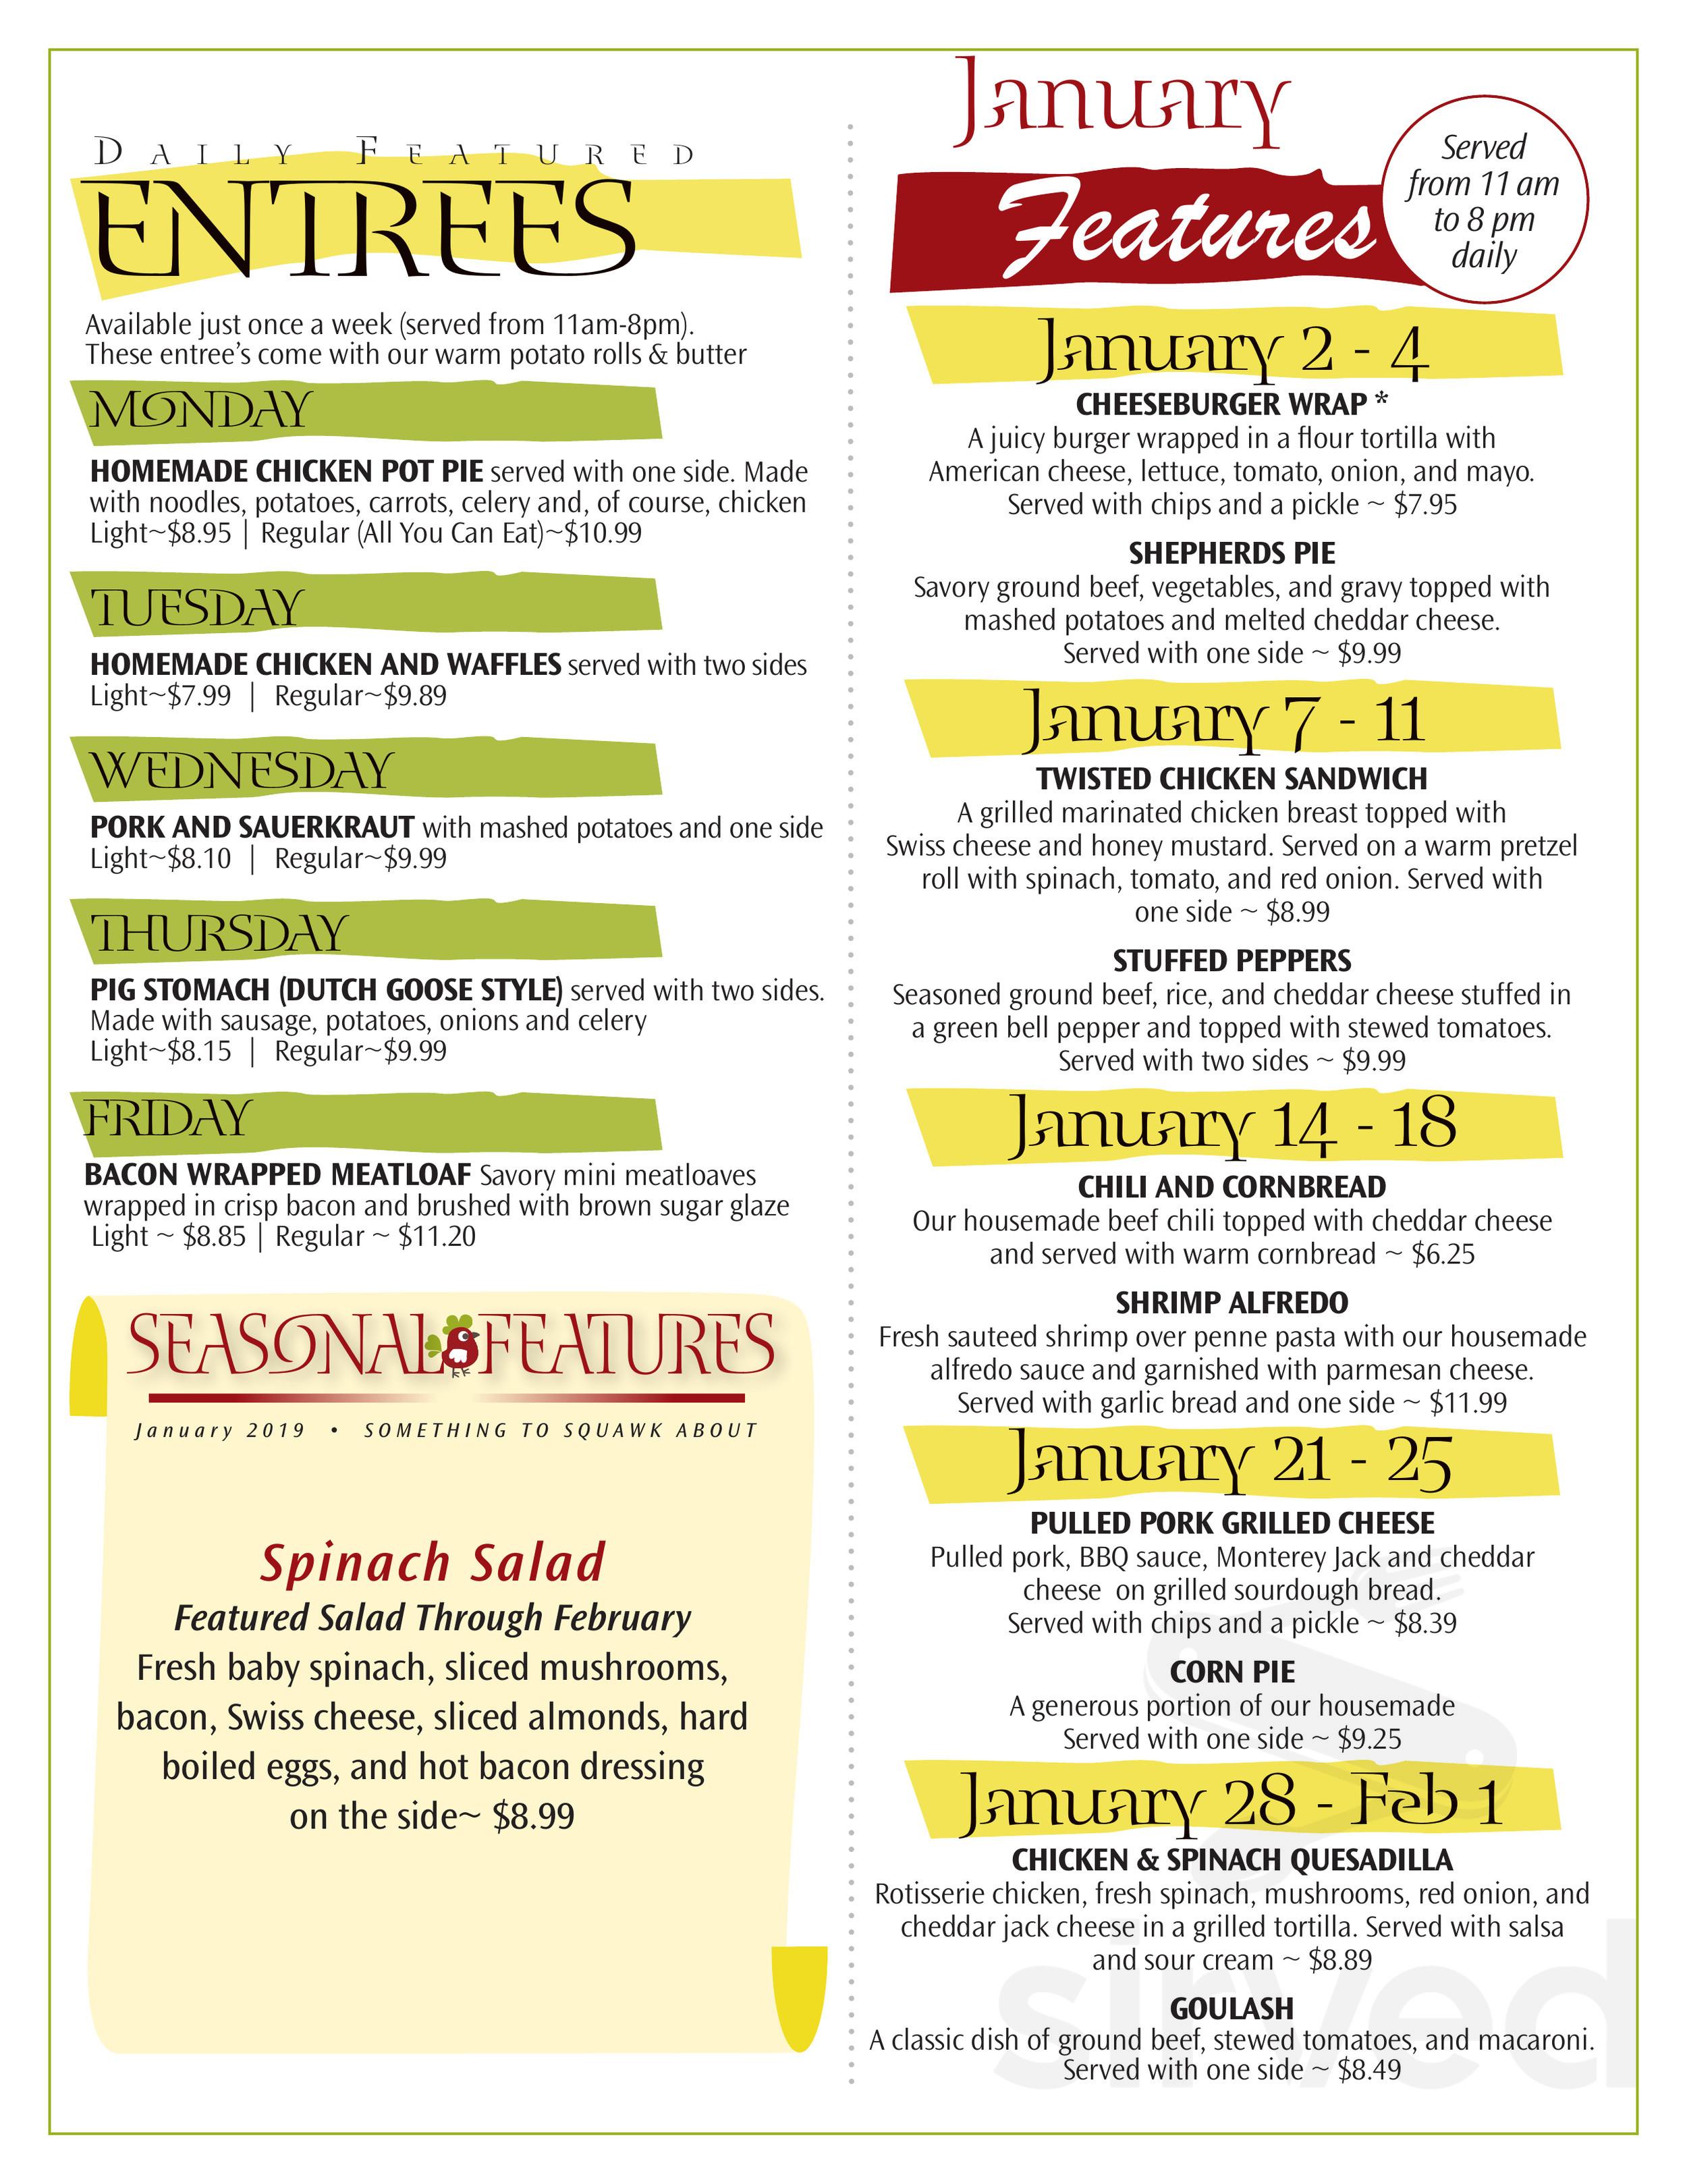 Lititz Family Cupboard Restaurant & Buffet menu in Lititz ...